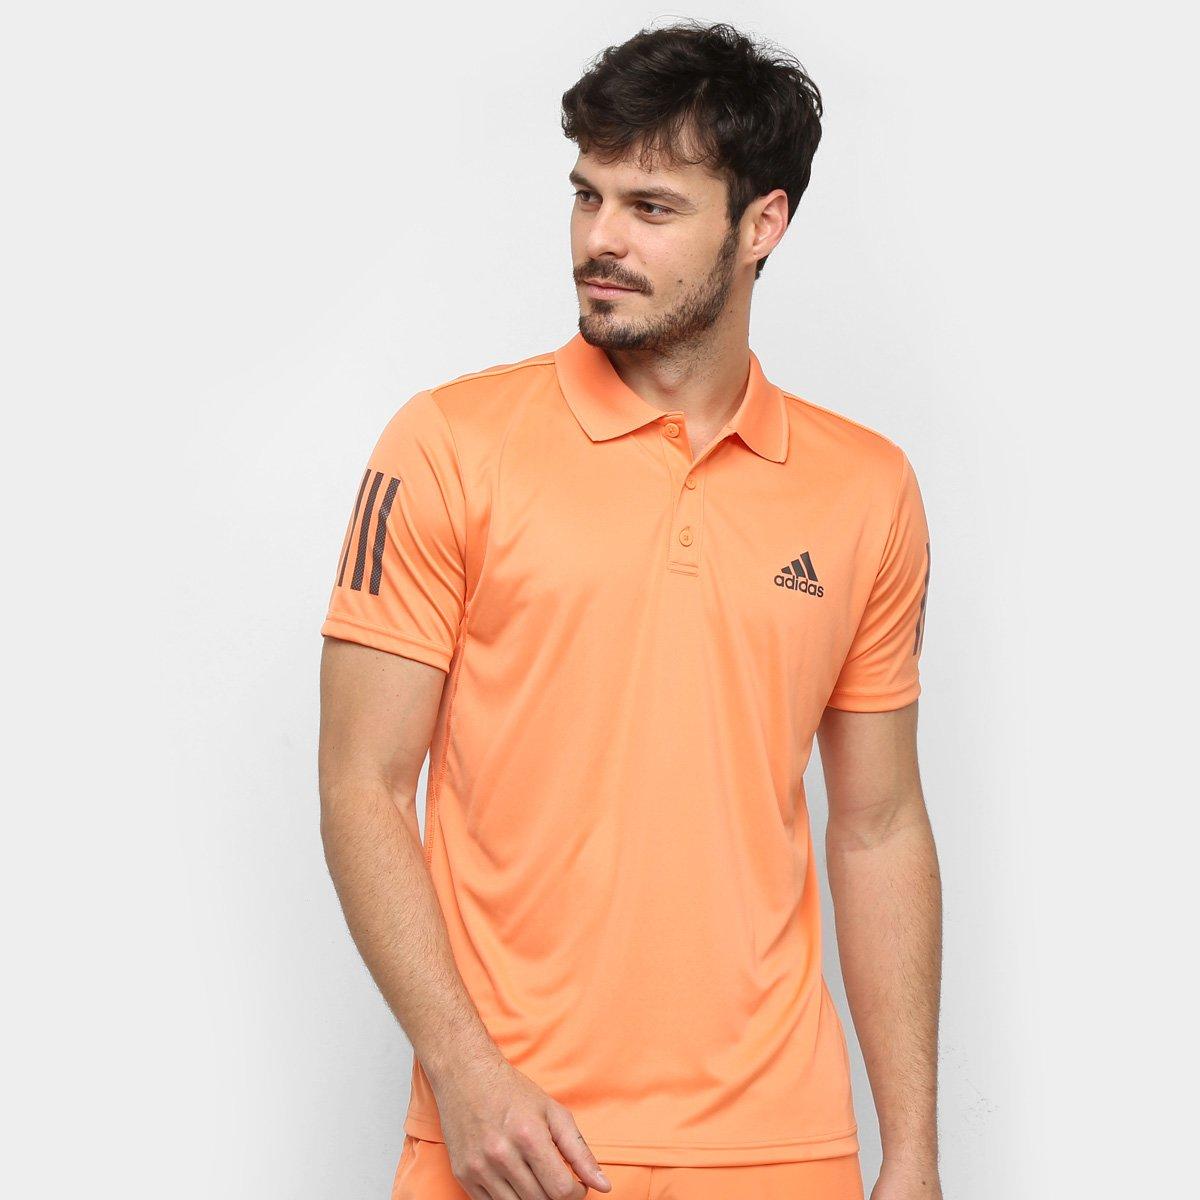 Camisa Polo Adidas Club 3 Stripes Masculina